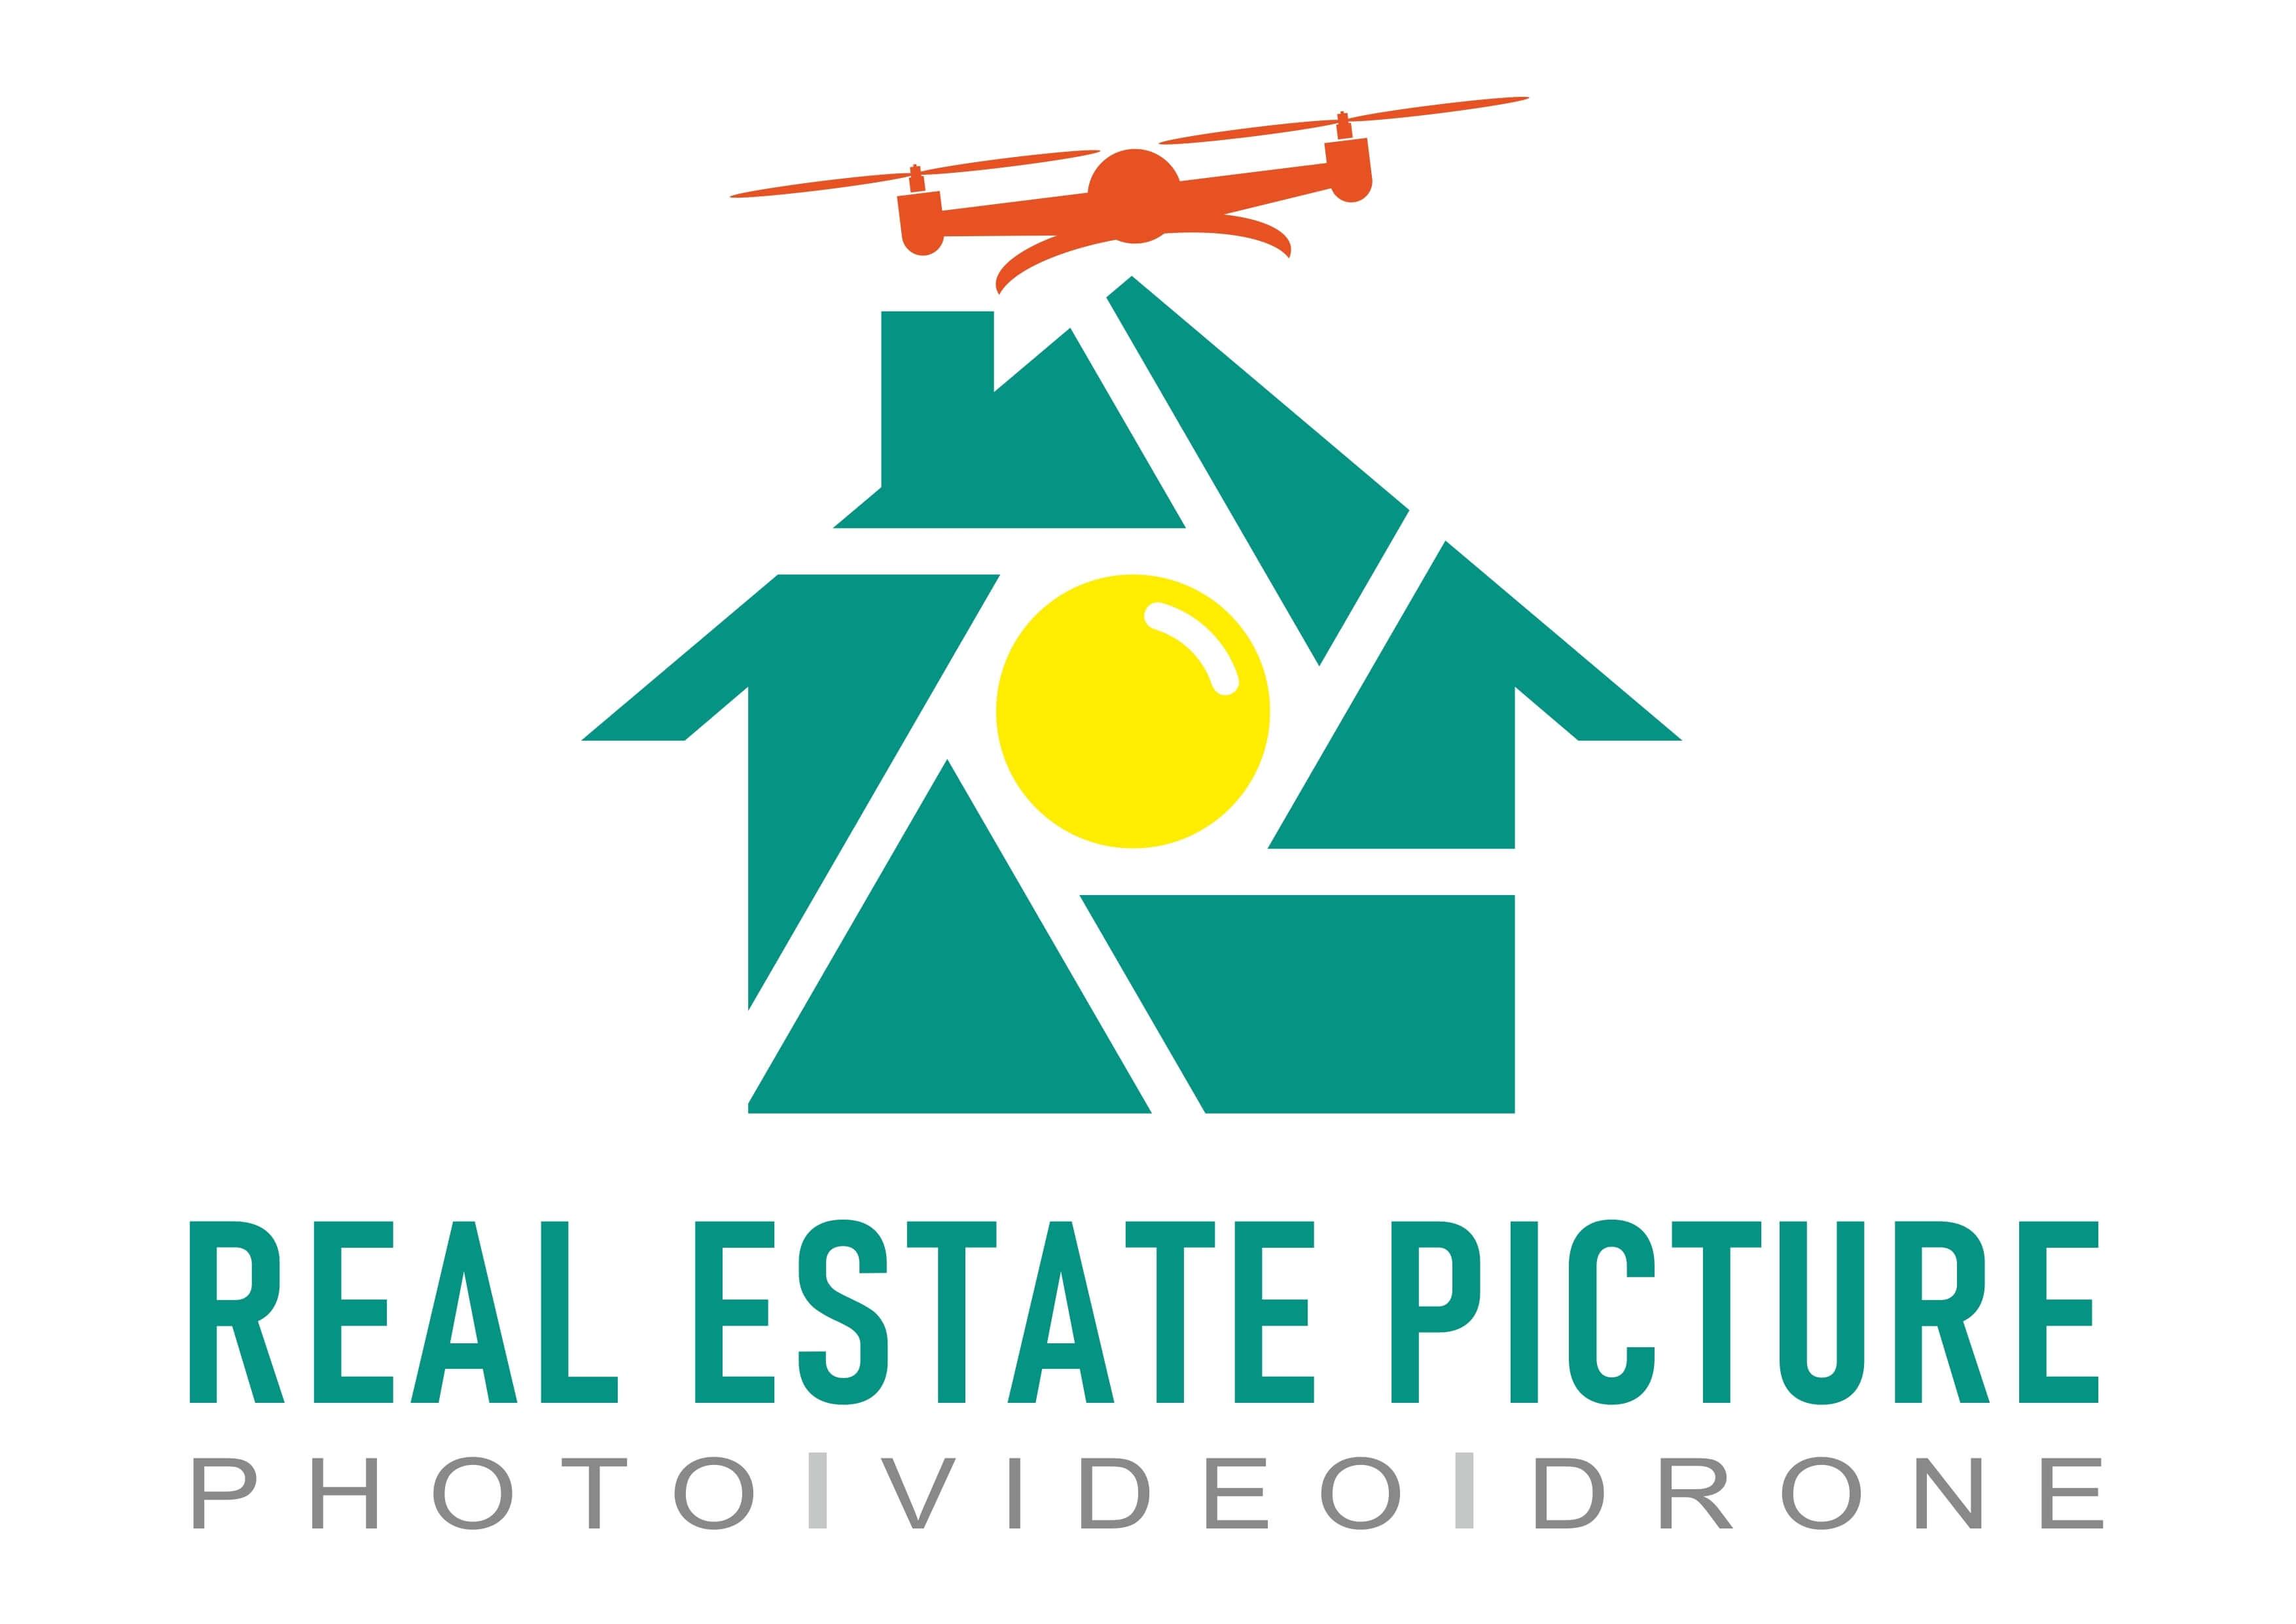 Real Estate Picture floor plan Gold Coast floor plan Tweed Heads